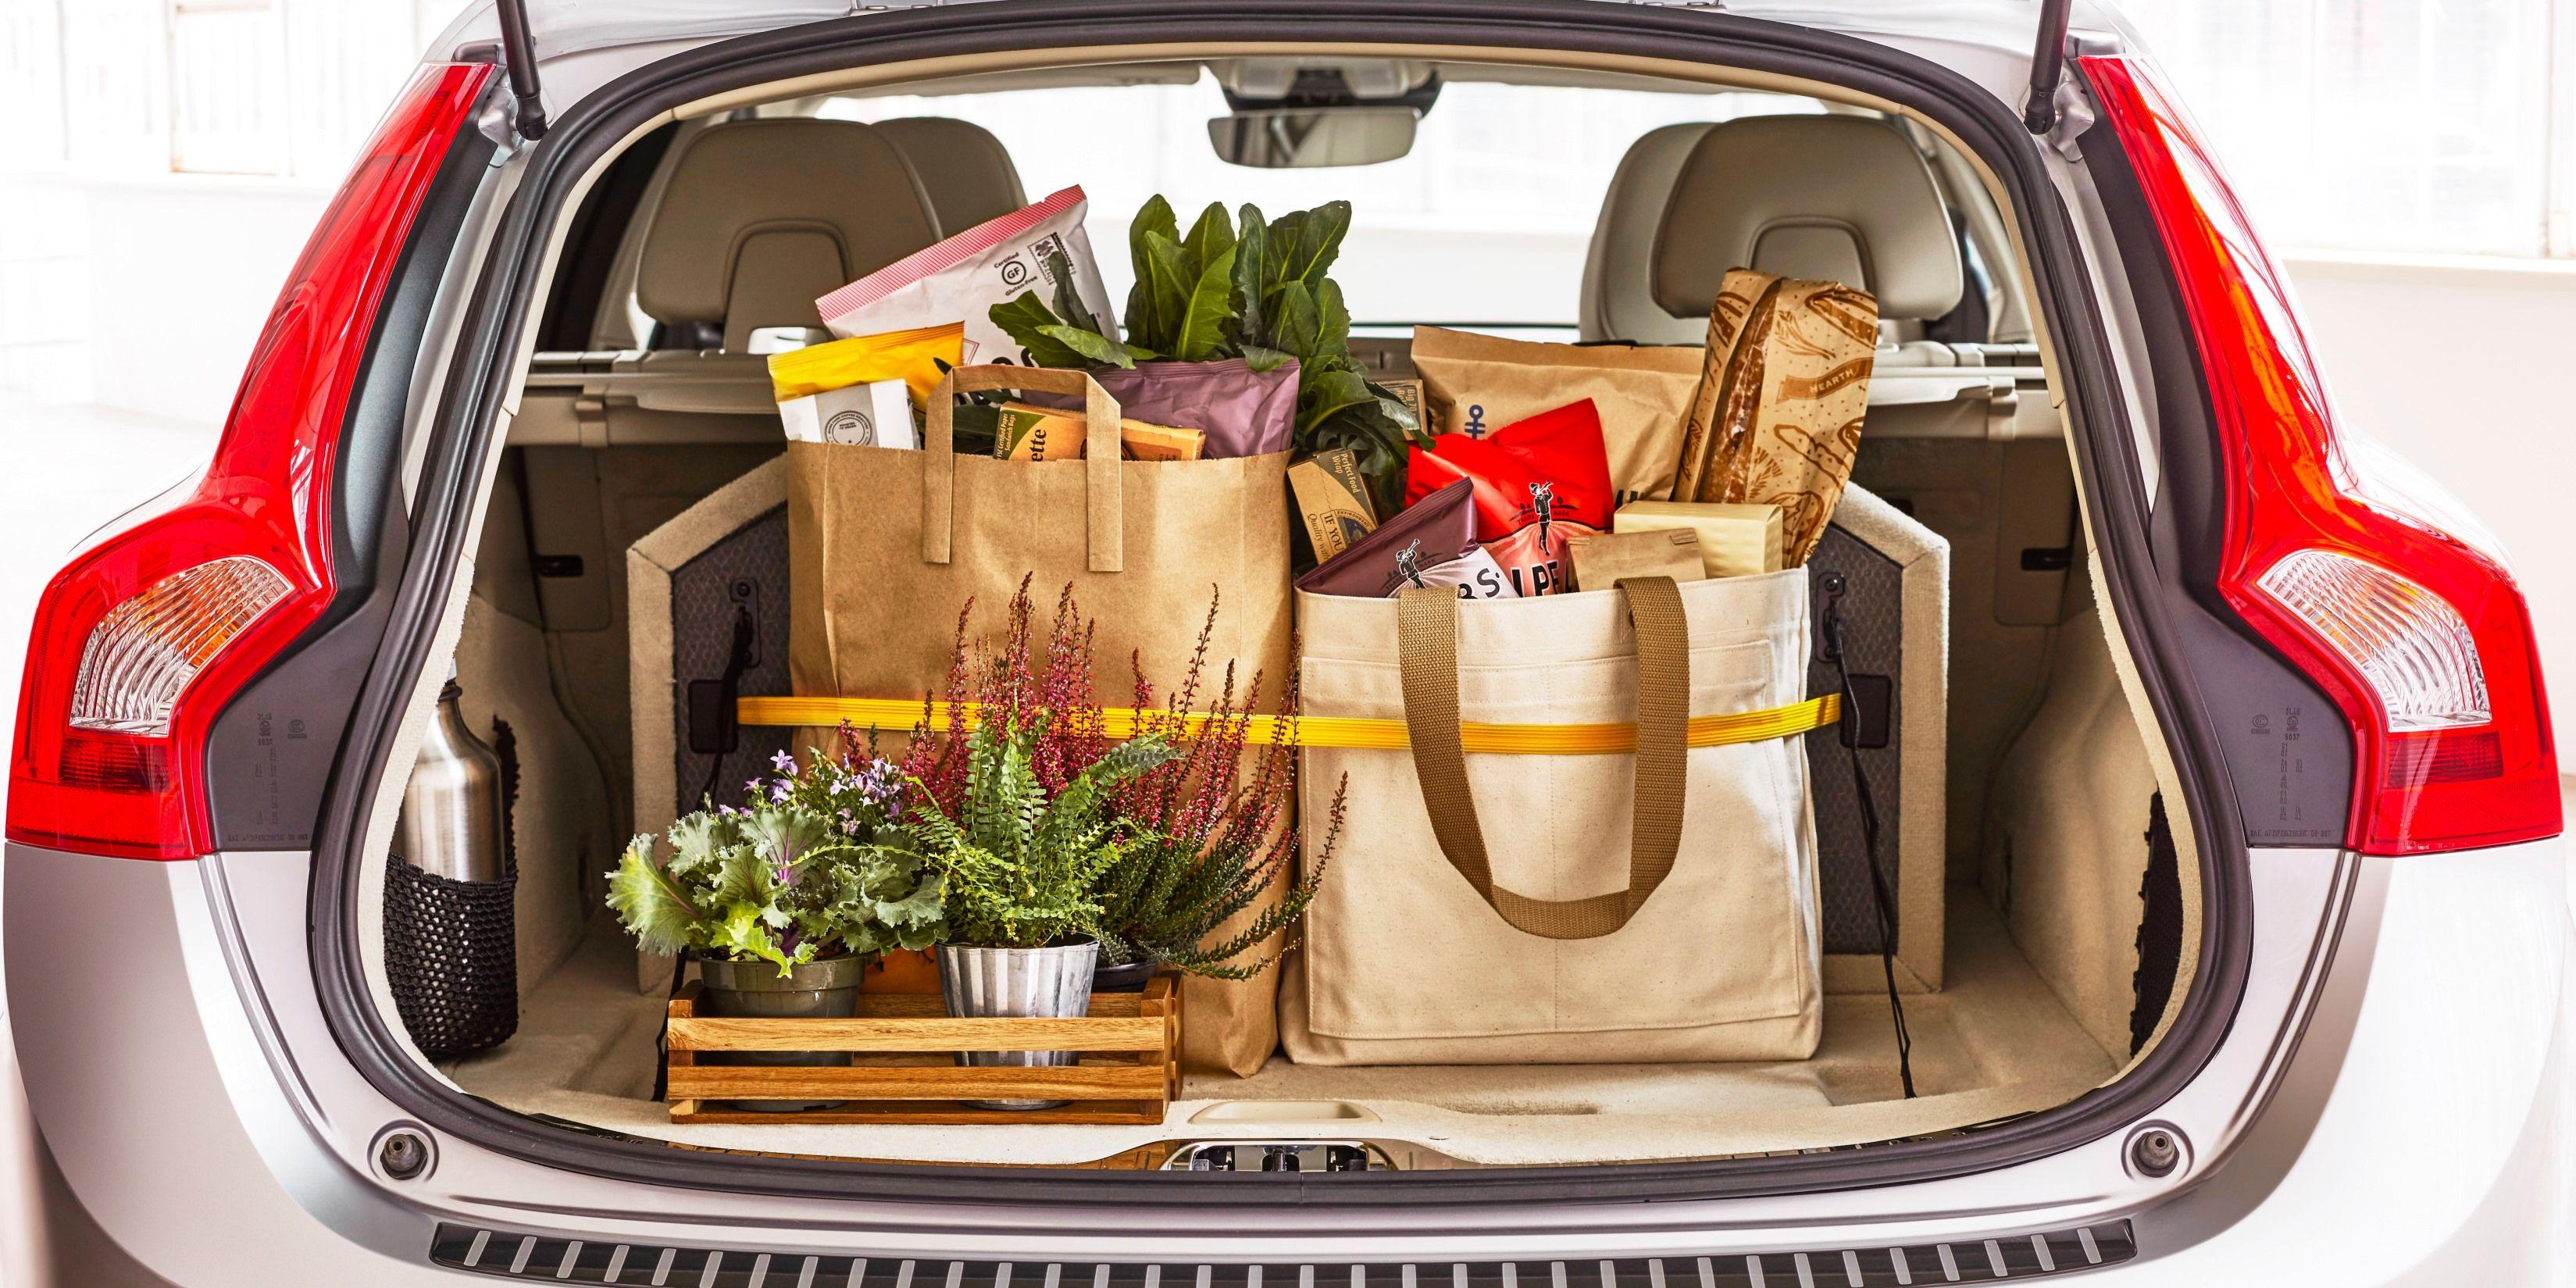 Car Organizing Ideas - Car Trunk Organizers and Tips